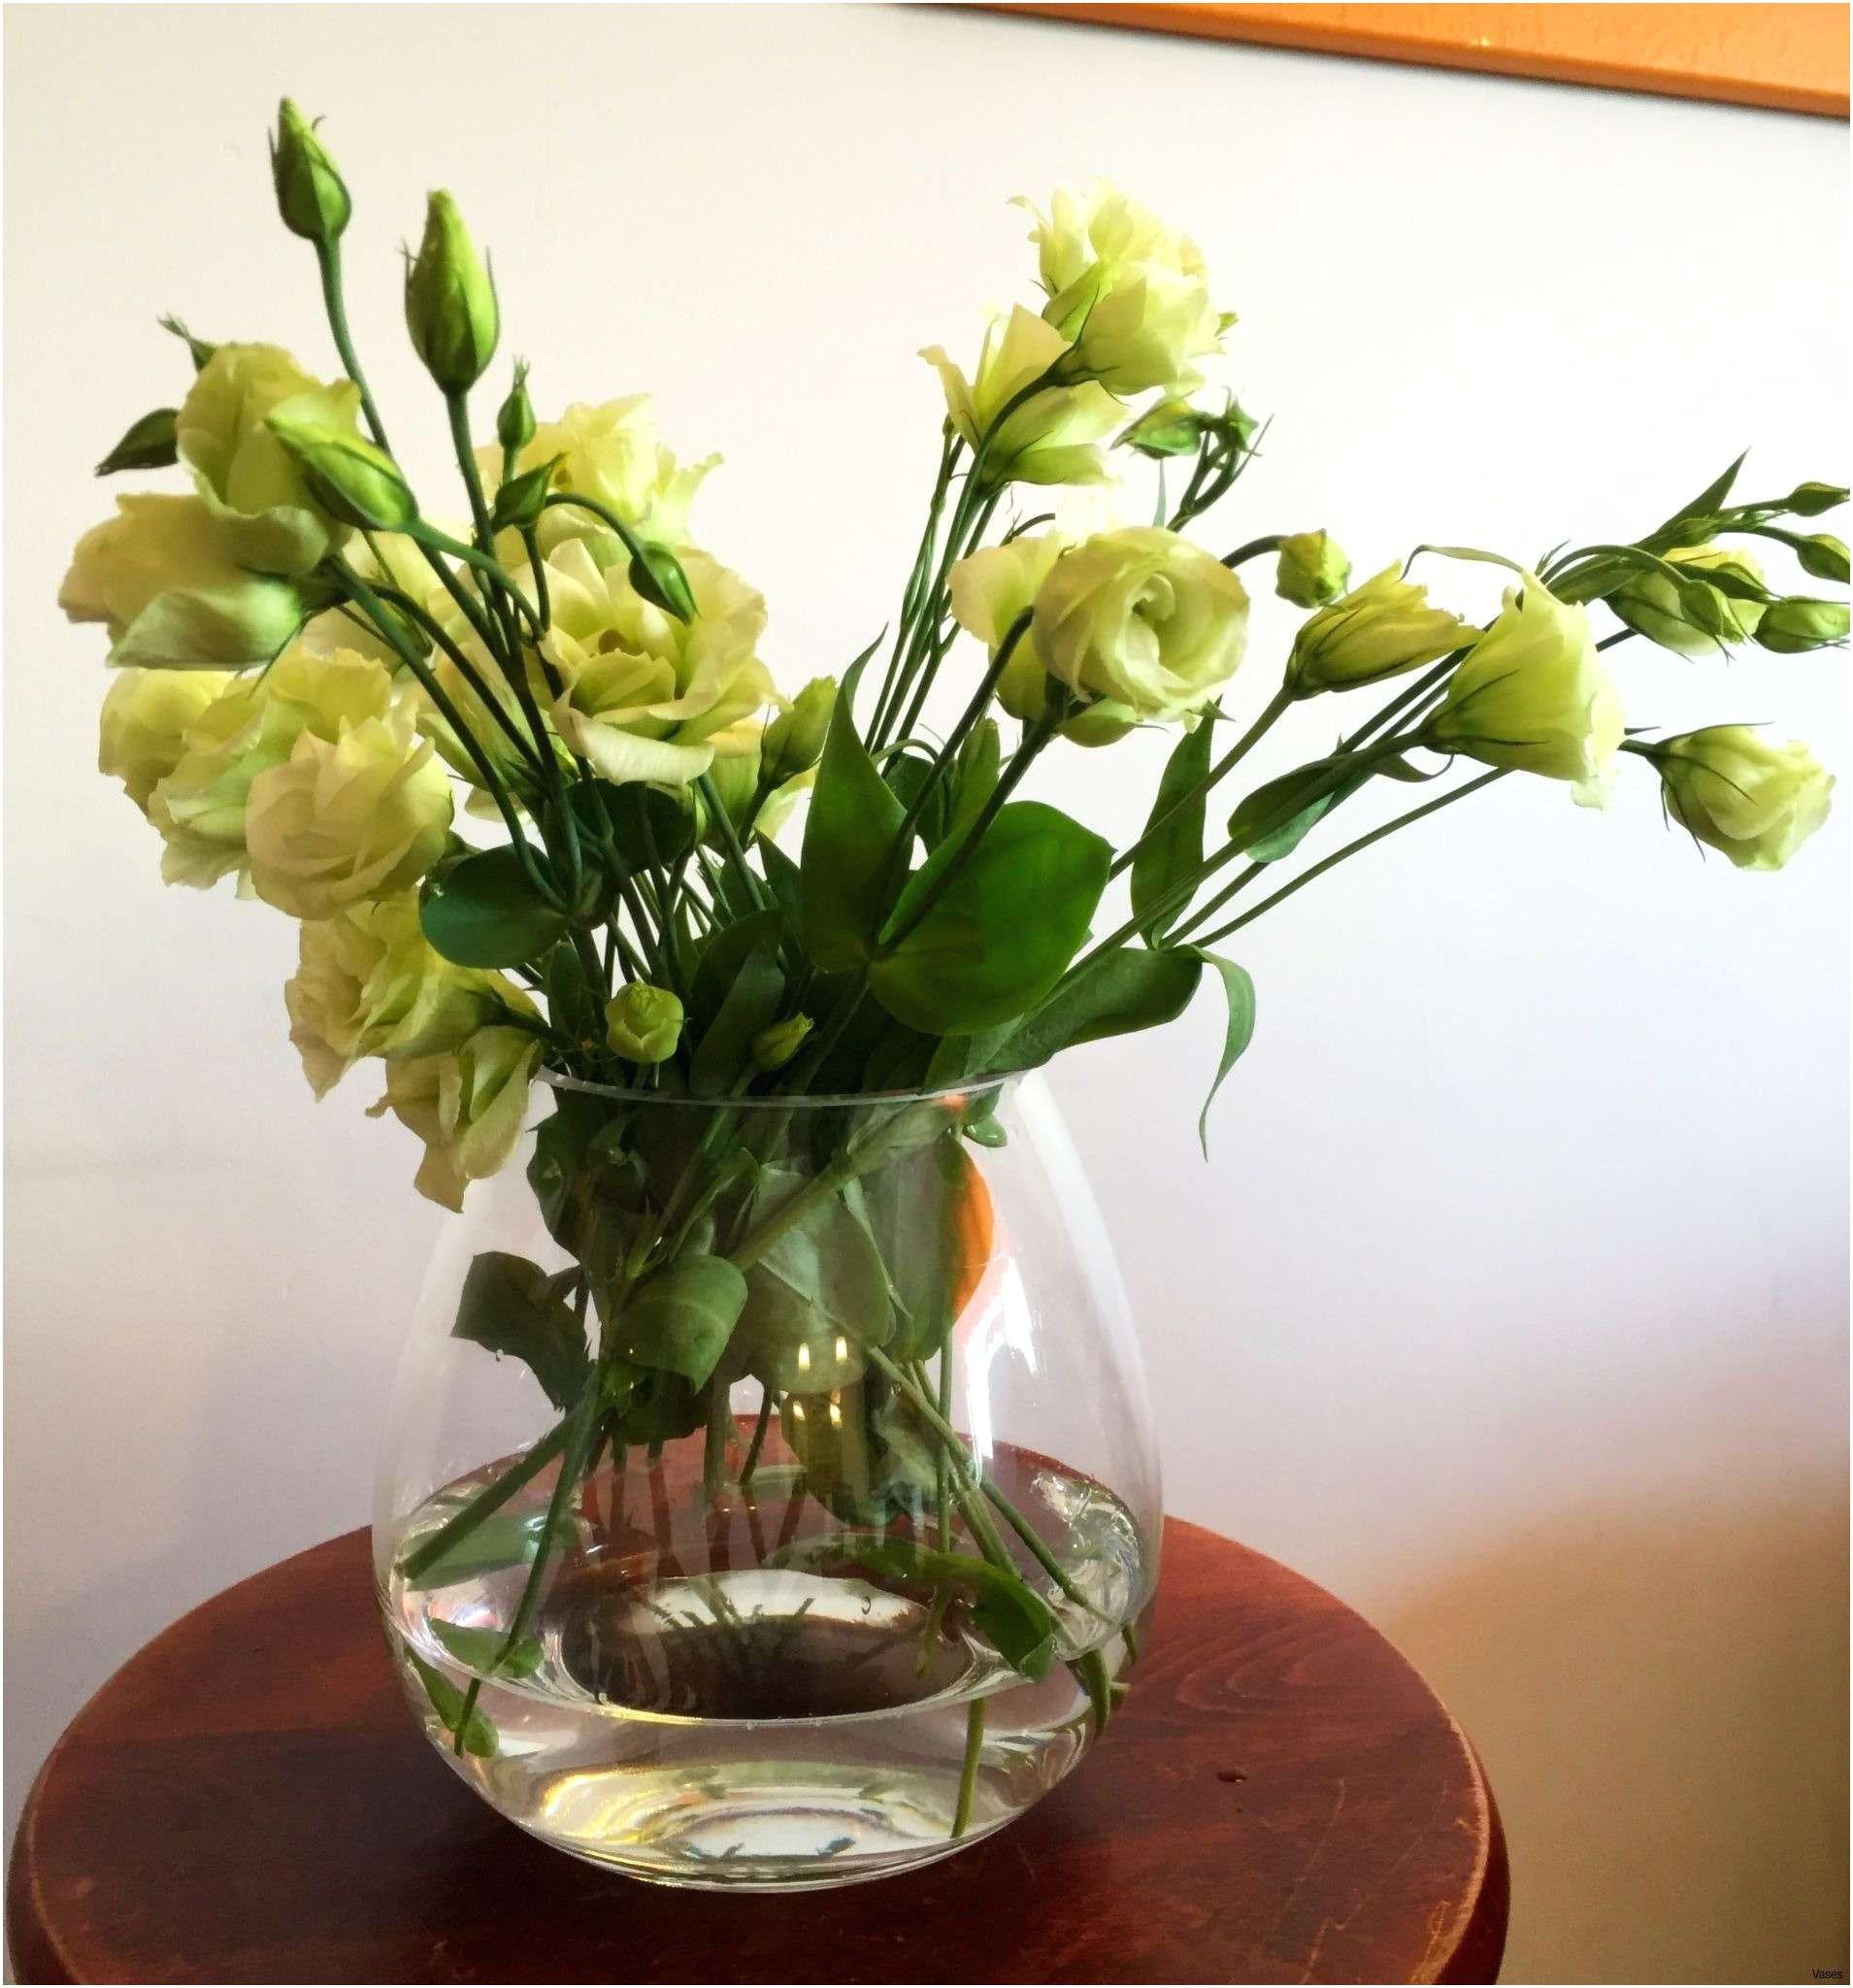 Plastic Flower Vases Bulk Of Tall Green Glass Vase Image Tiger Height Awful Flower Vase Table 04h Regarding Tall Green Glass Vase Image Tiger Height Awful Flower Vase Table 04h Vases Tablei 0d Clipart